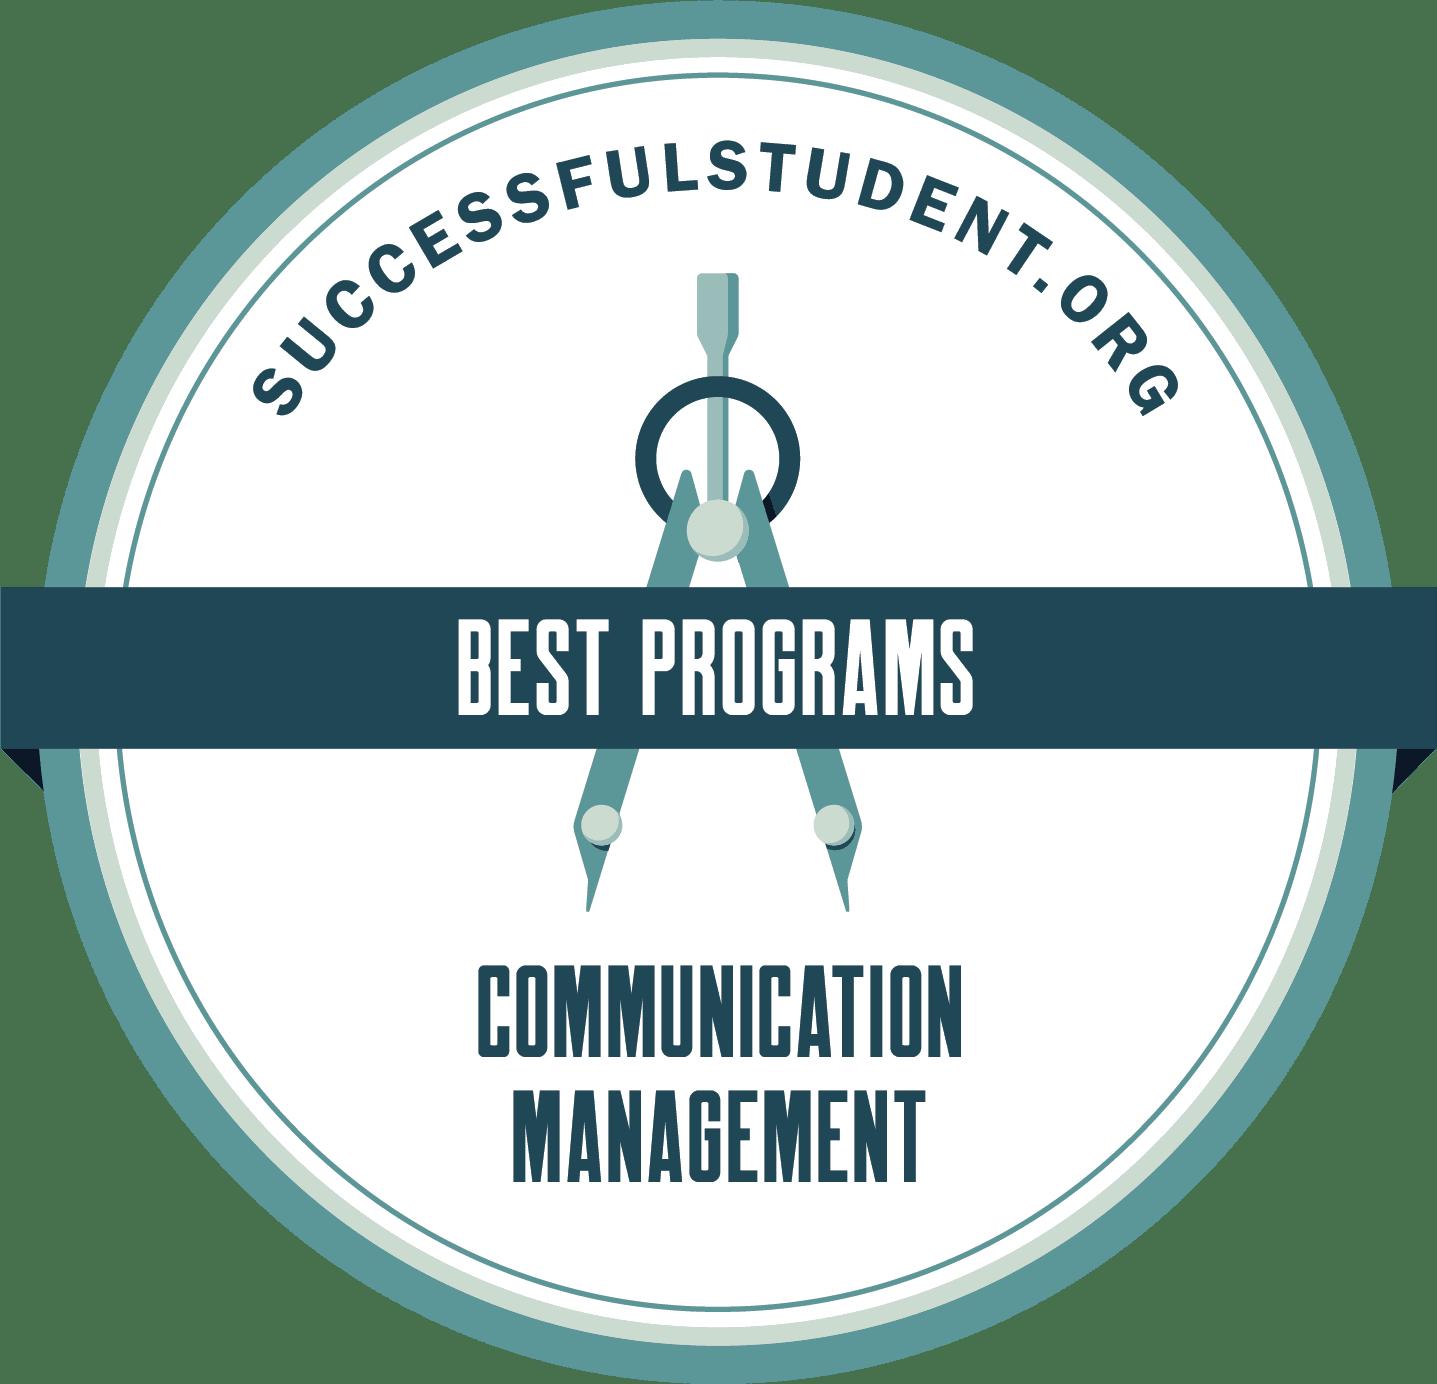 17 Best Communication Management Programs's Badge